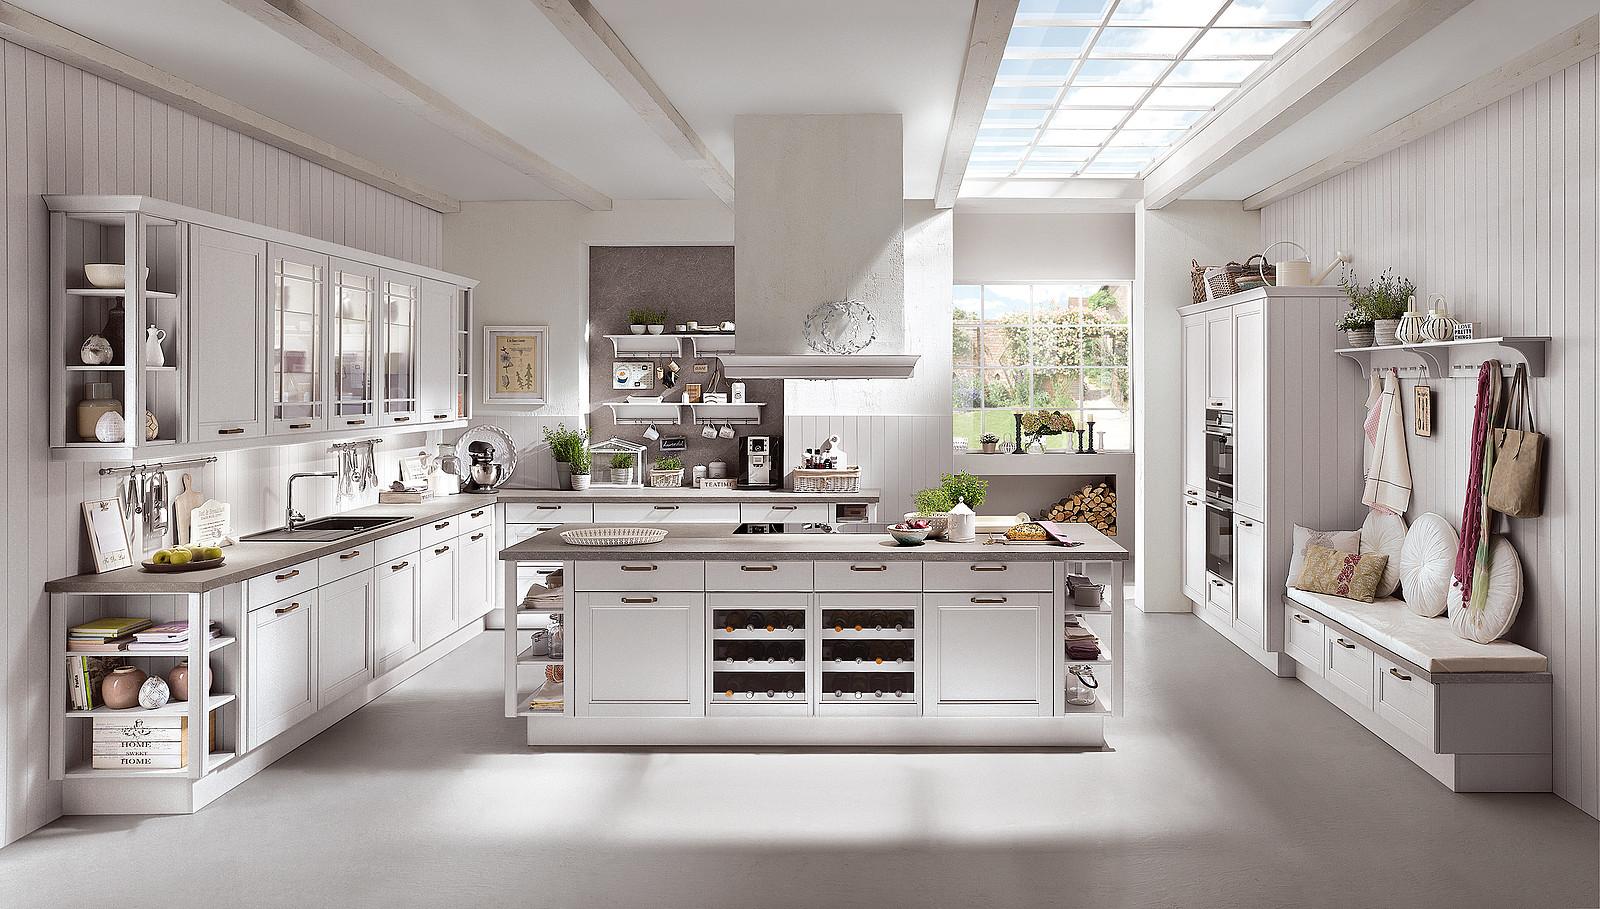 Full Size of Lüftung Küche Lüftung Küche Ohne Fenster Lüftung Küche Gastronomie Dichtheitsklasse Lüftung Küche Küche Lüftung Küche